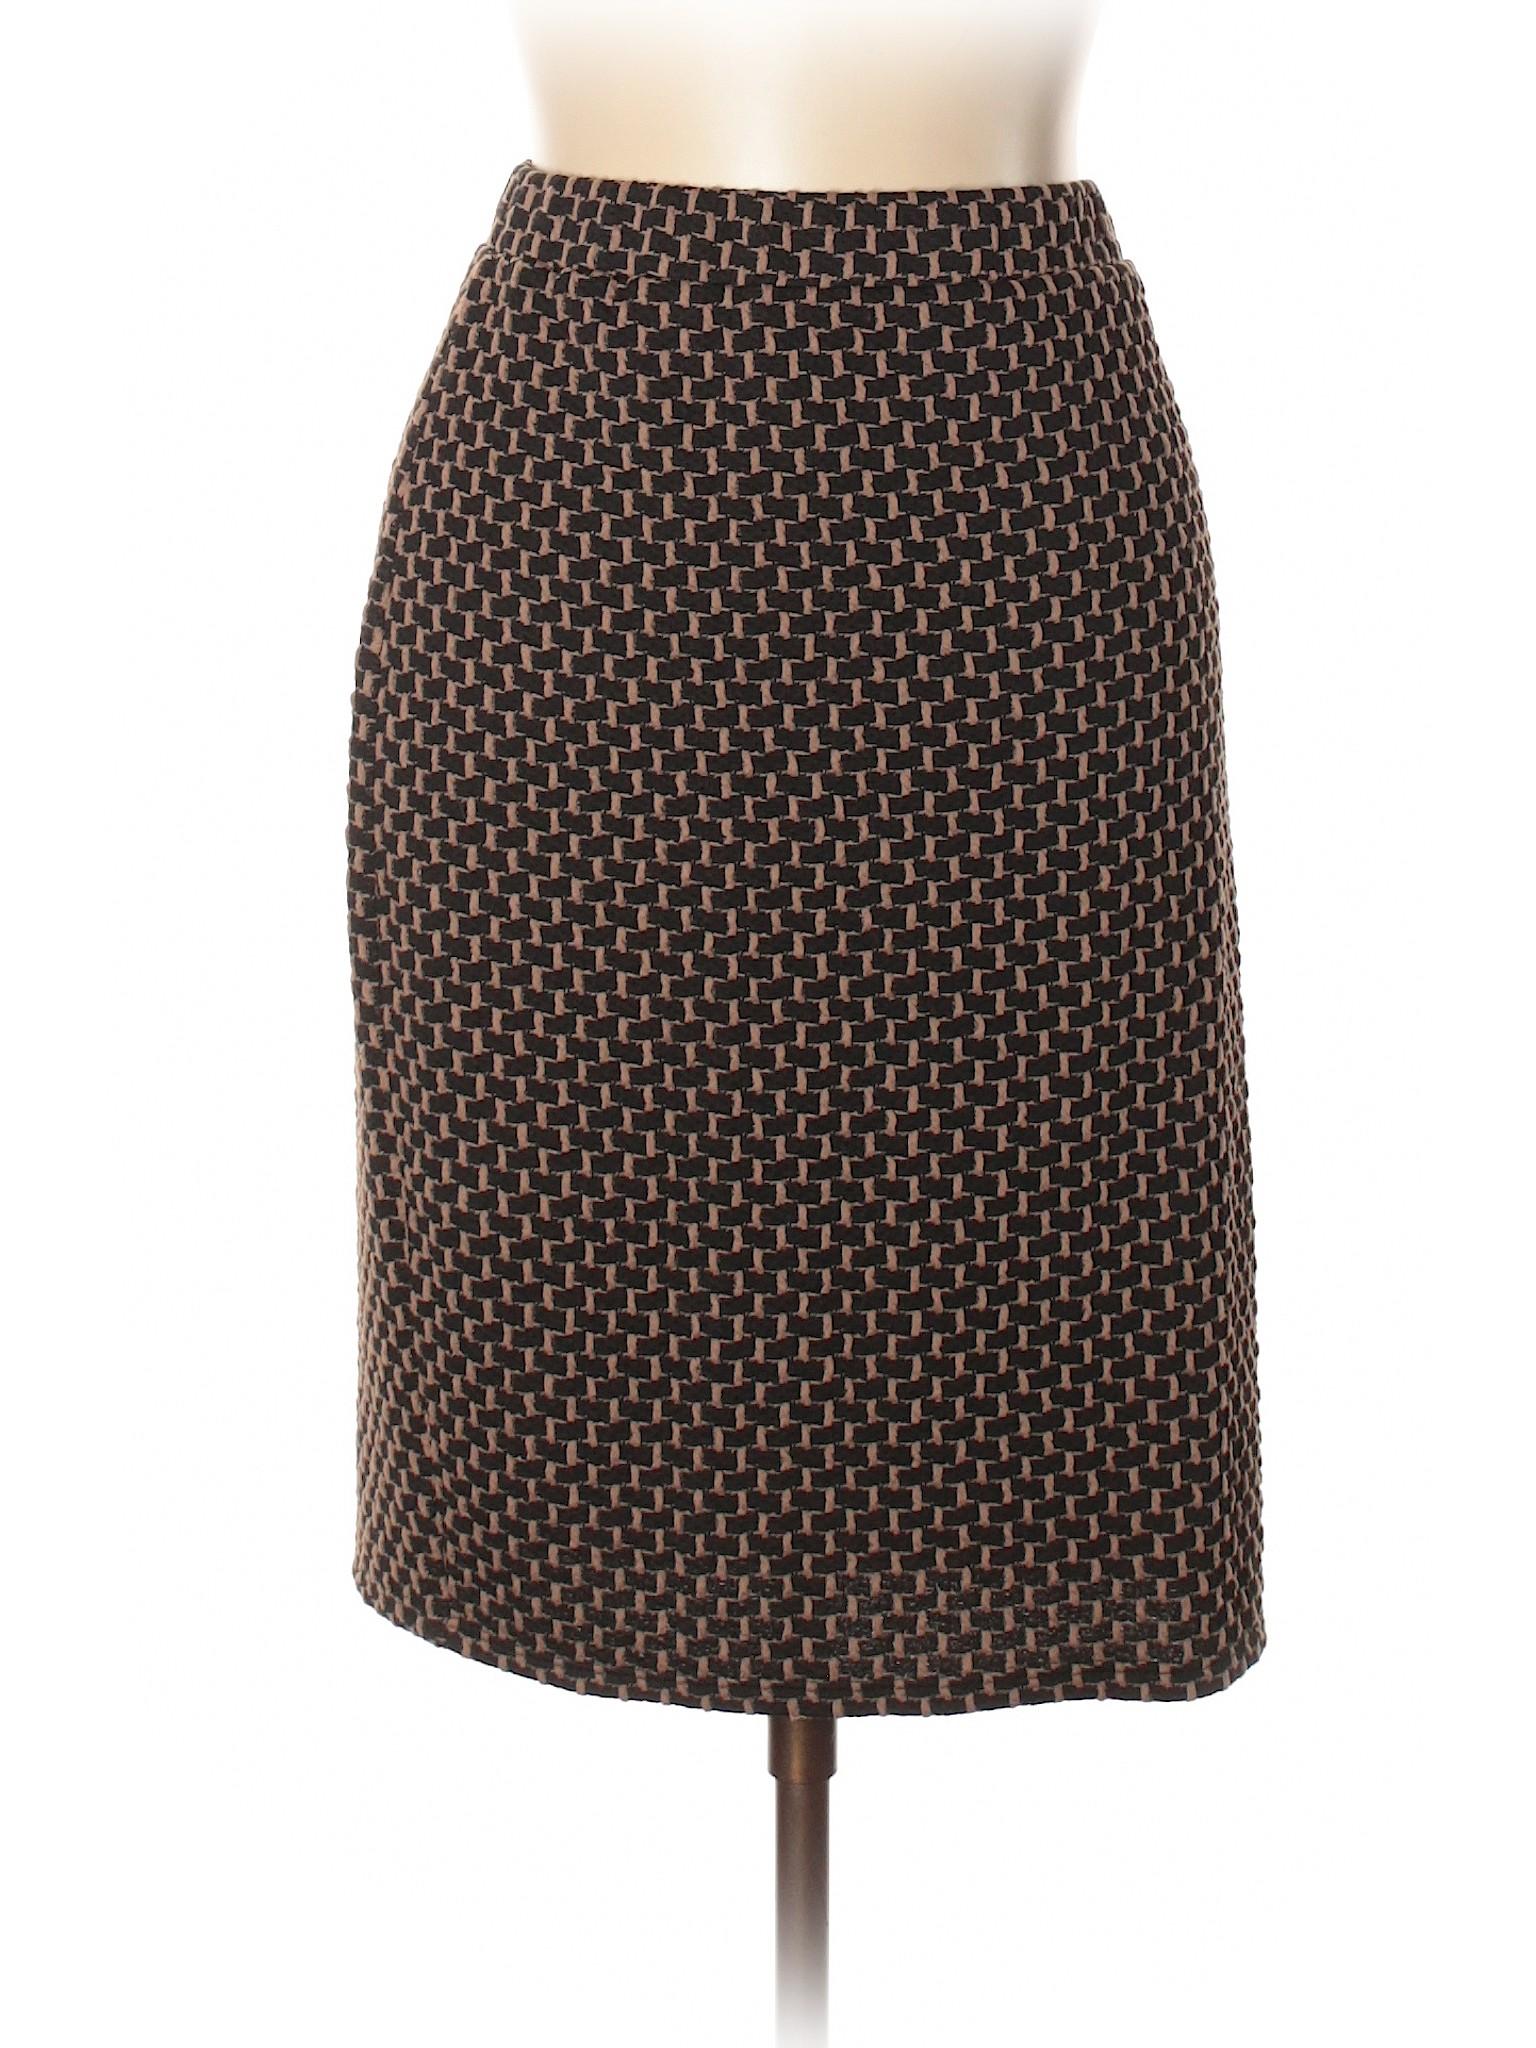 Skirt Boutique Boutique Casual Skirt Boutique Boutique Boutique Casual Casual Casual Skirt Casual Skirt Skirt Boutique Casual HnRZAqR0w